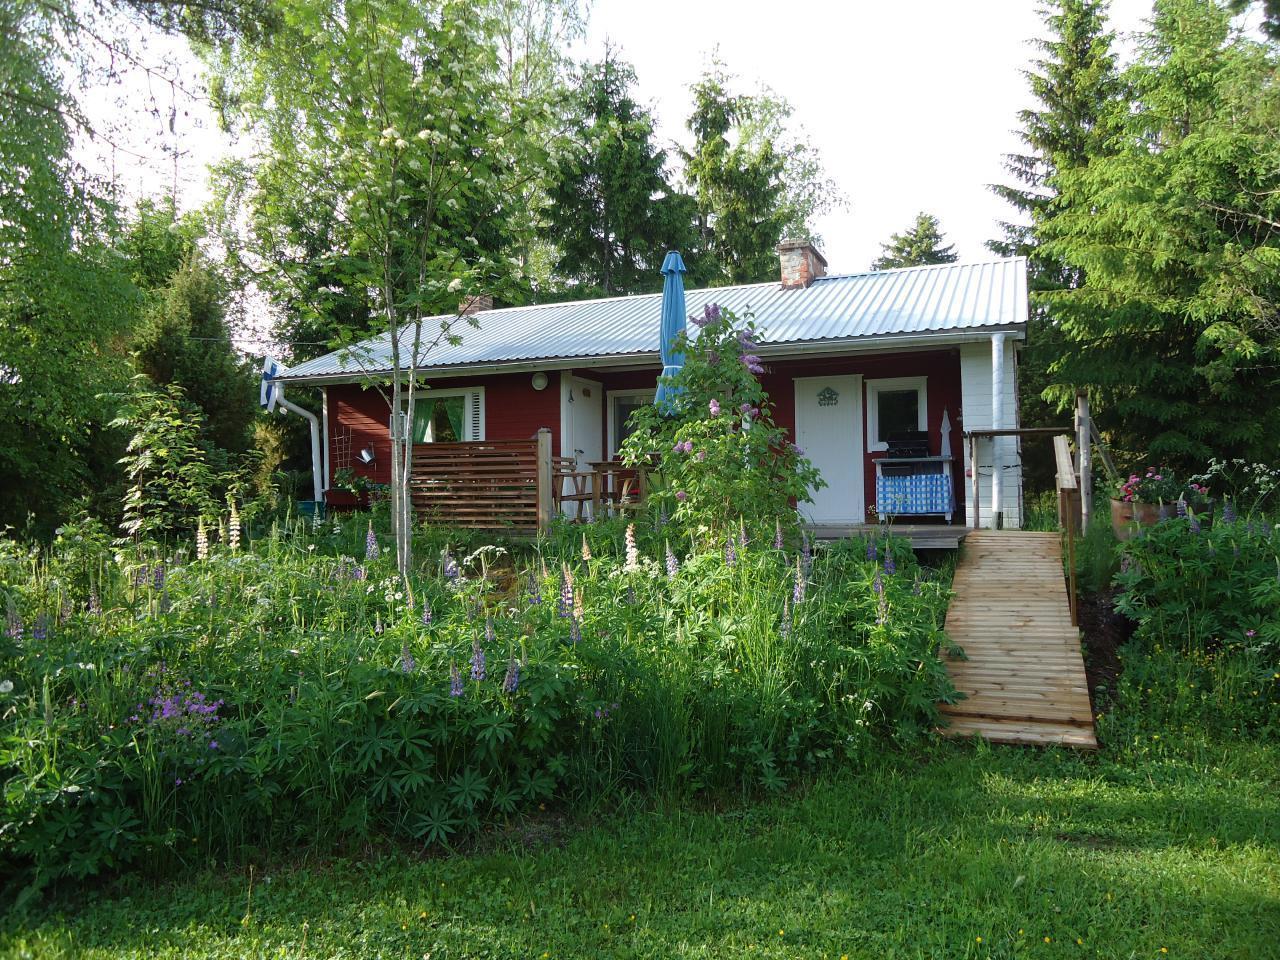 Ferienhaus - Mökki mit Sauna direkt am See  in Mouhijärvi-Sastamala (1707905), Mouhijärvi, , Westfinnland, Finnland, Bild 26